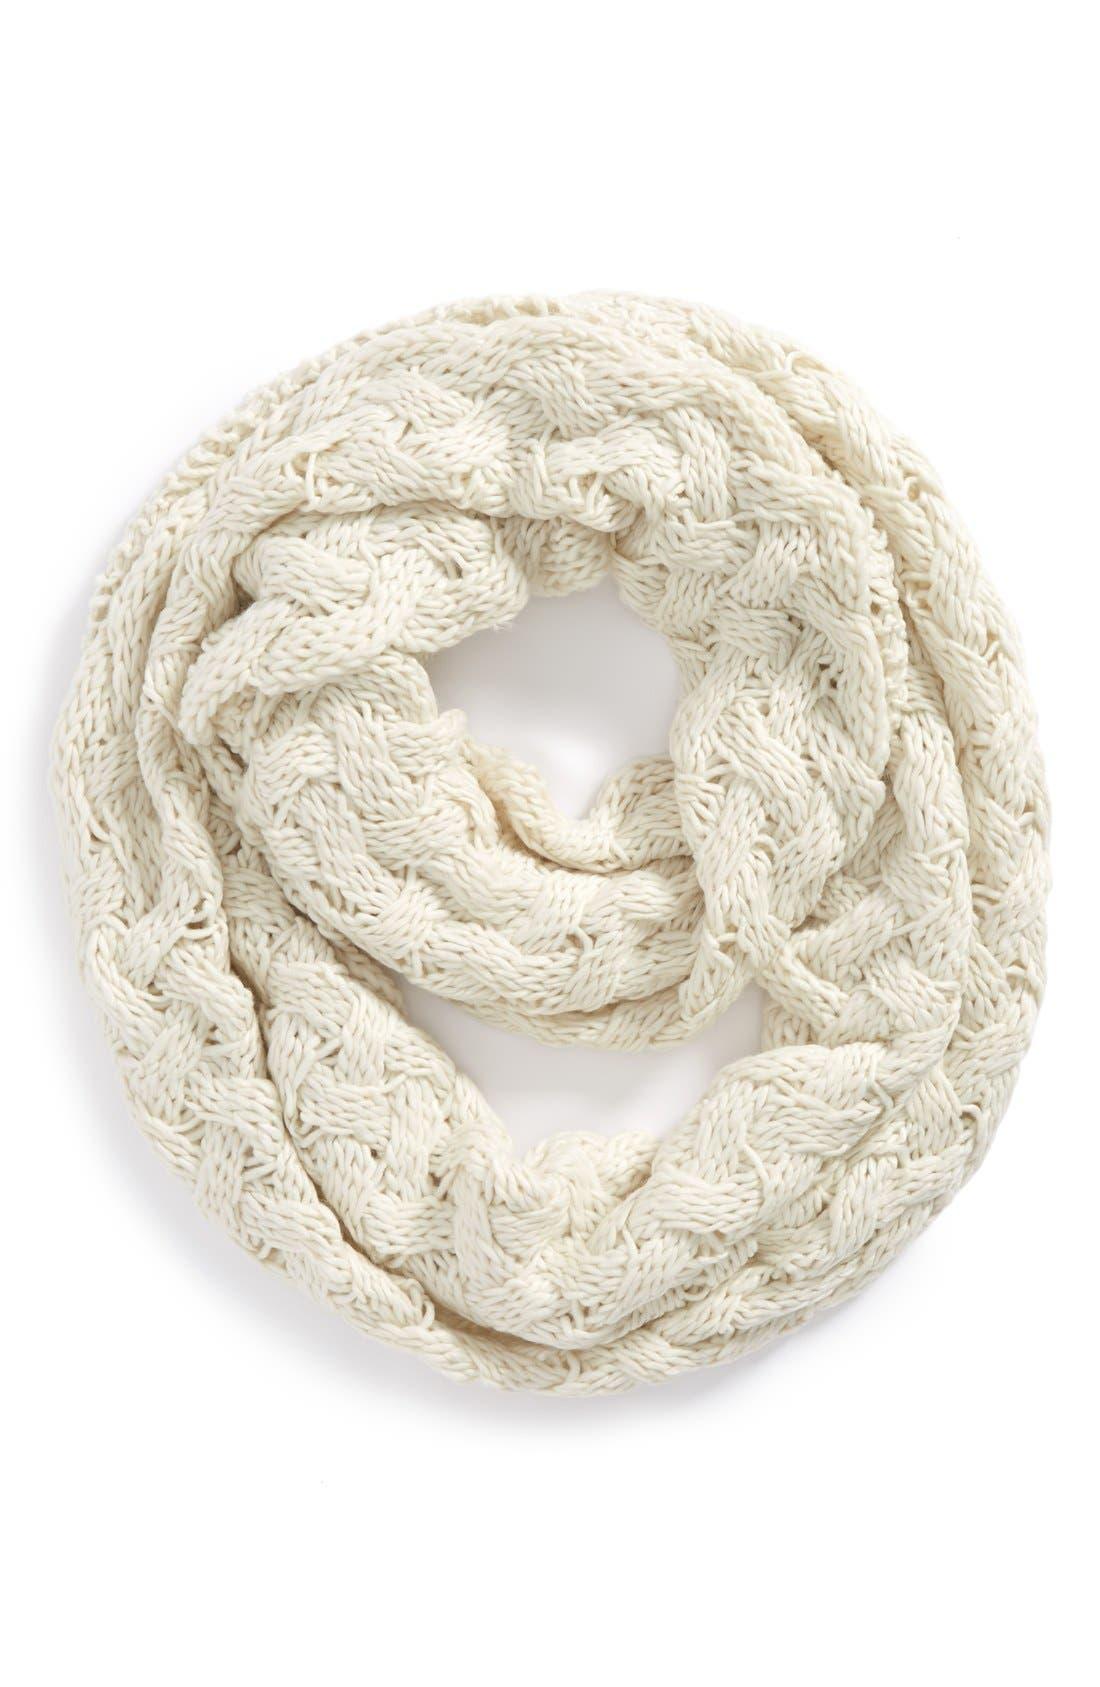 Alternate Image 1 Selected - Tildon Crisscross Knit Infinity Scarf